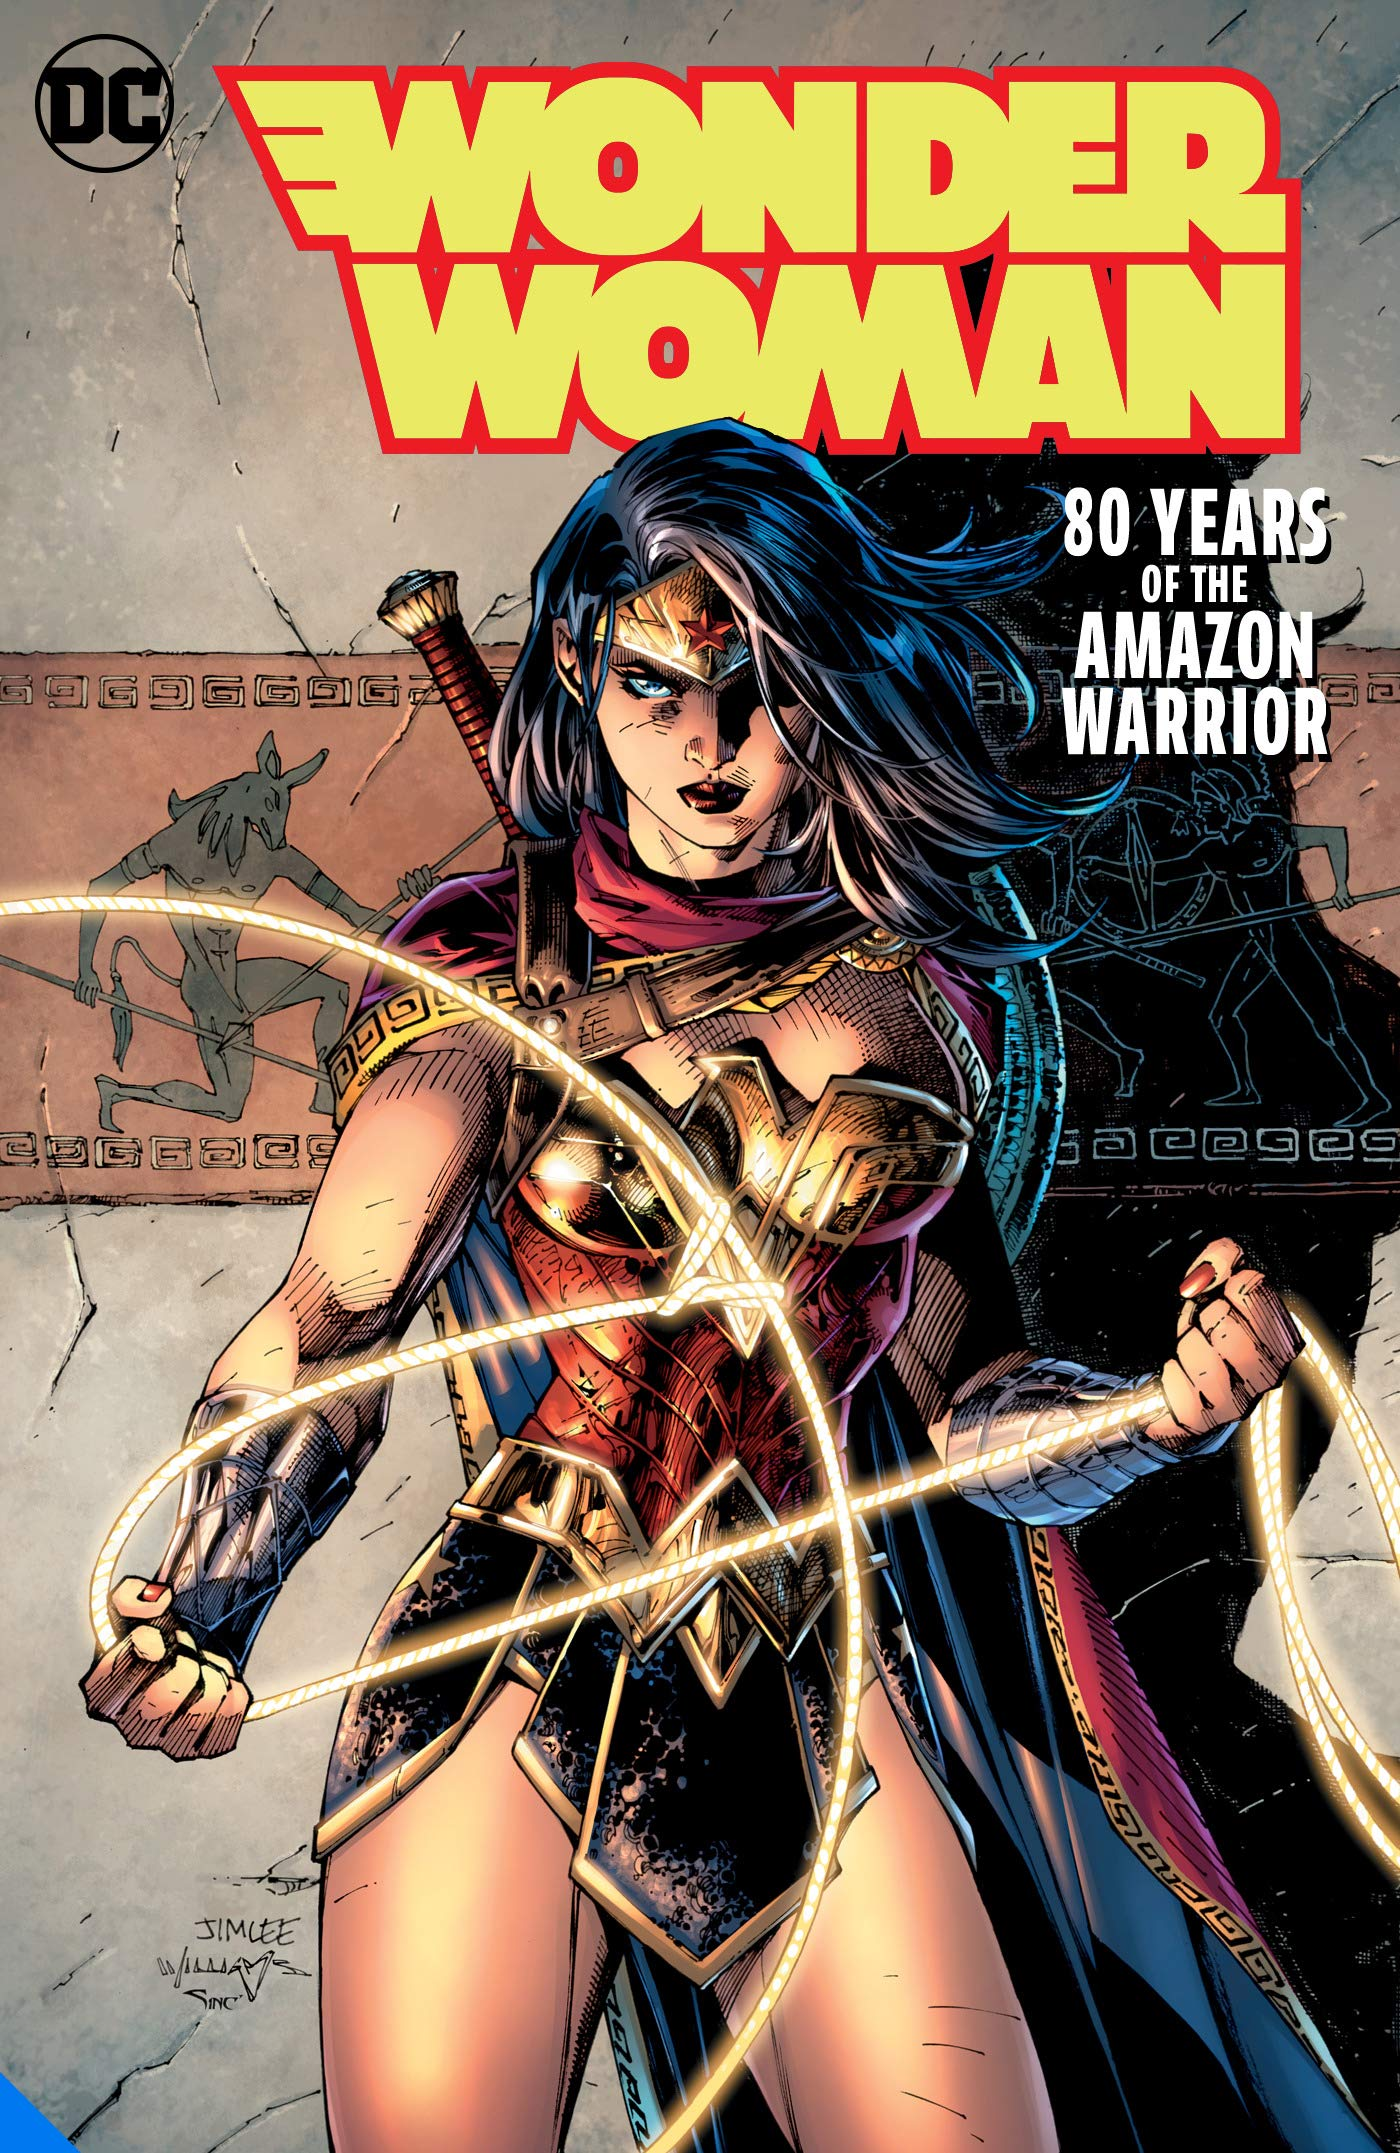 Wonder Woman: 80 Years of the Amazon Warrior